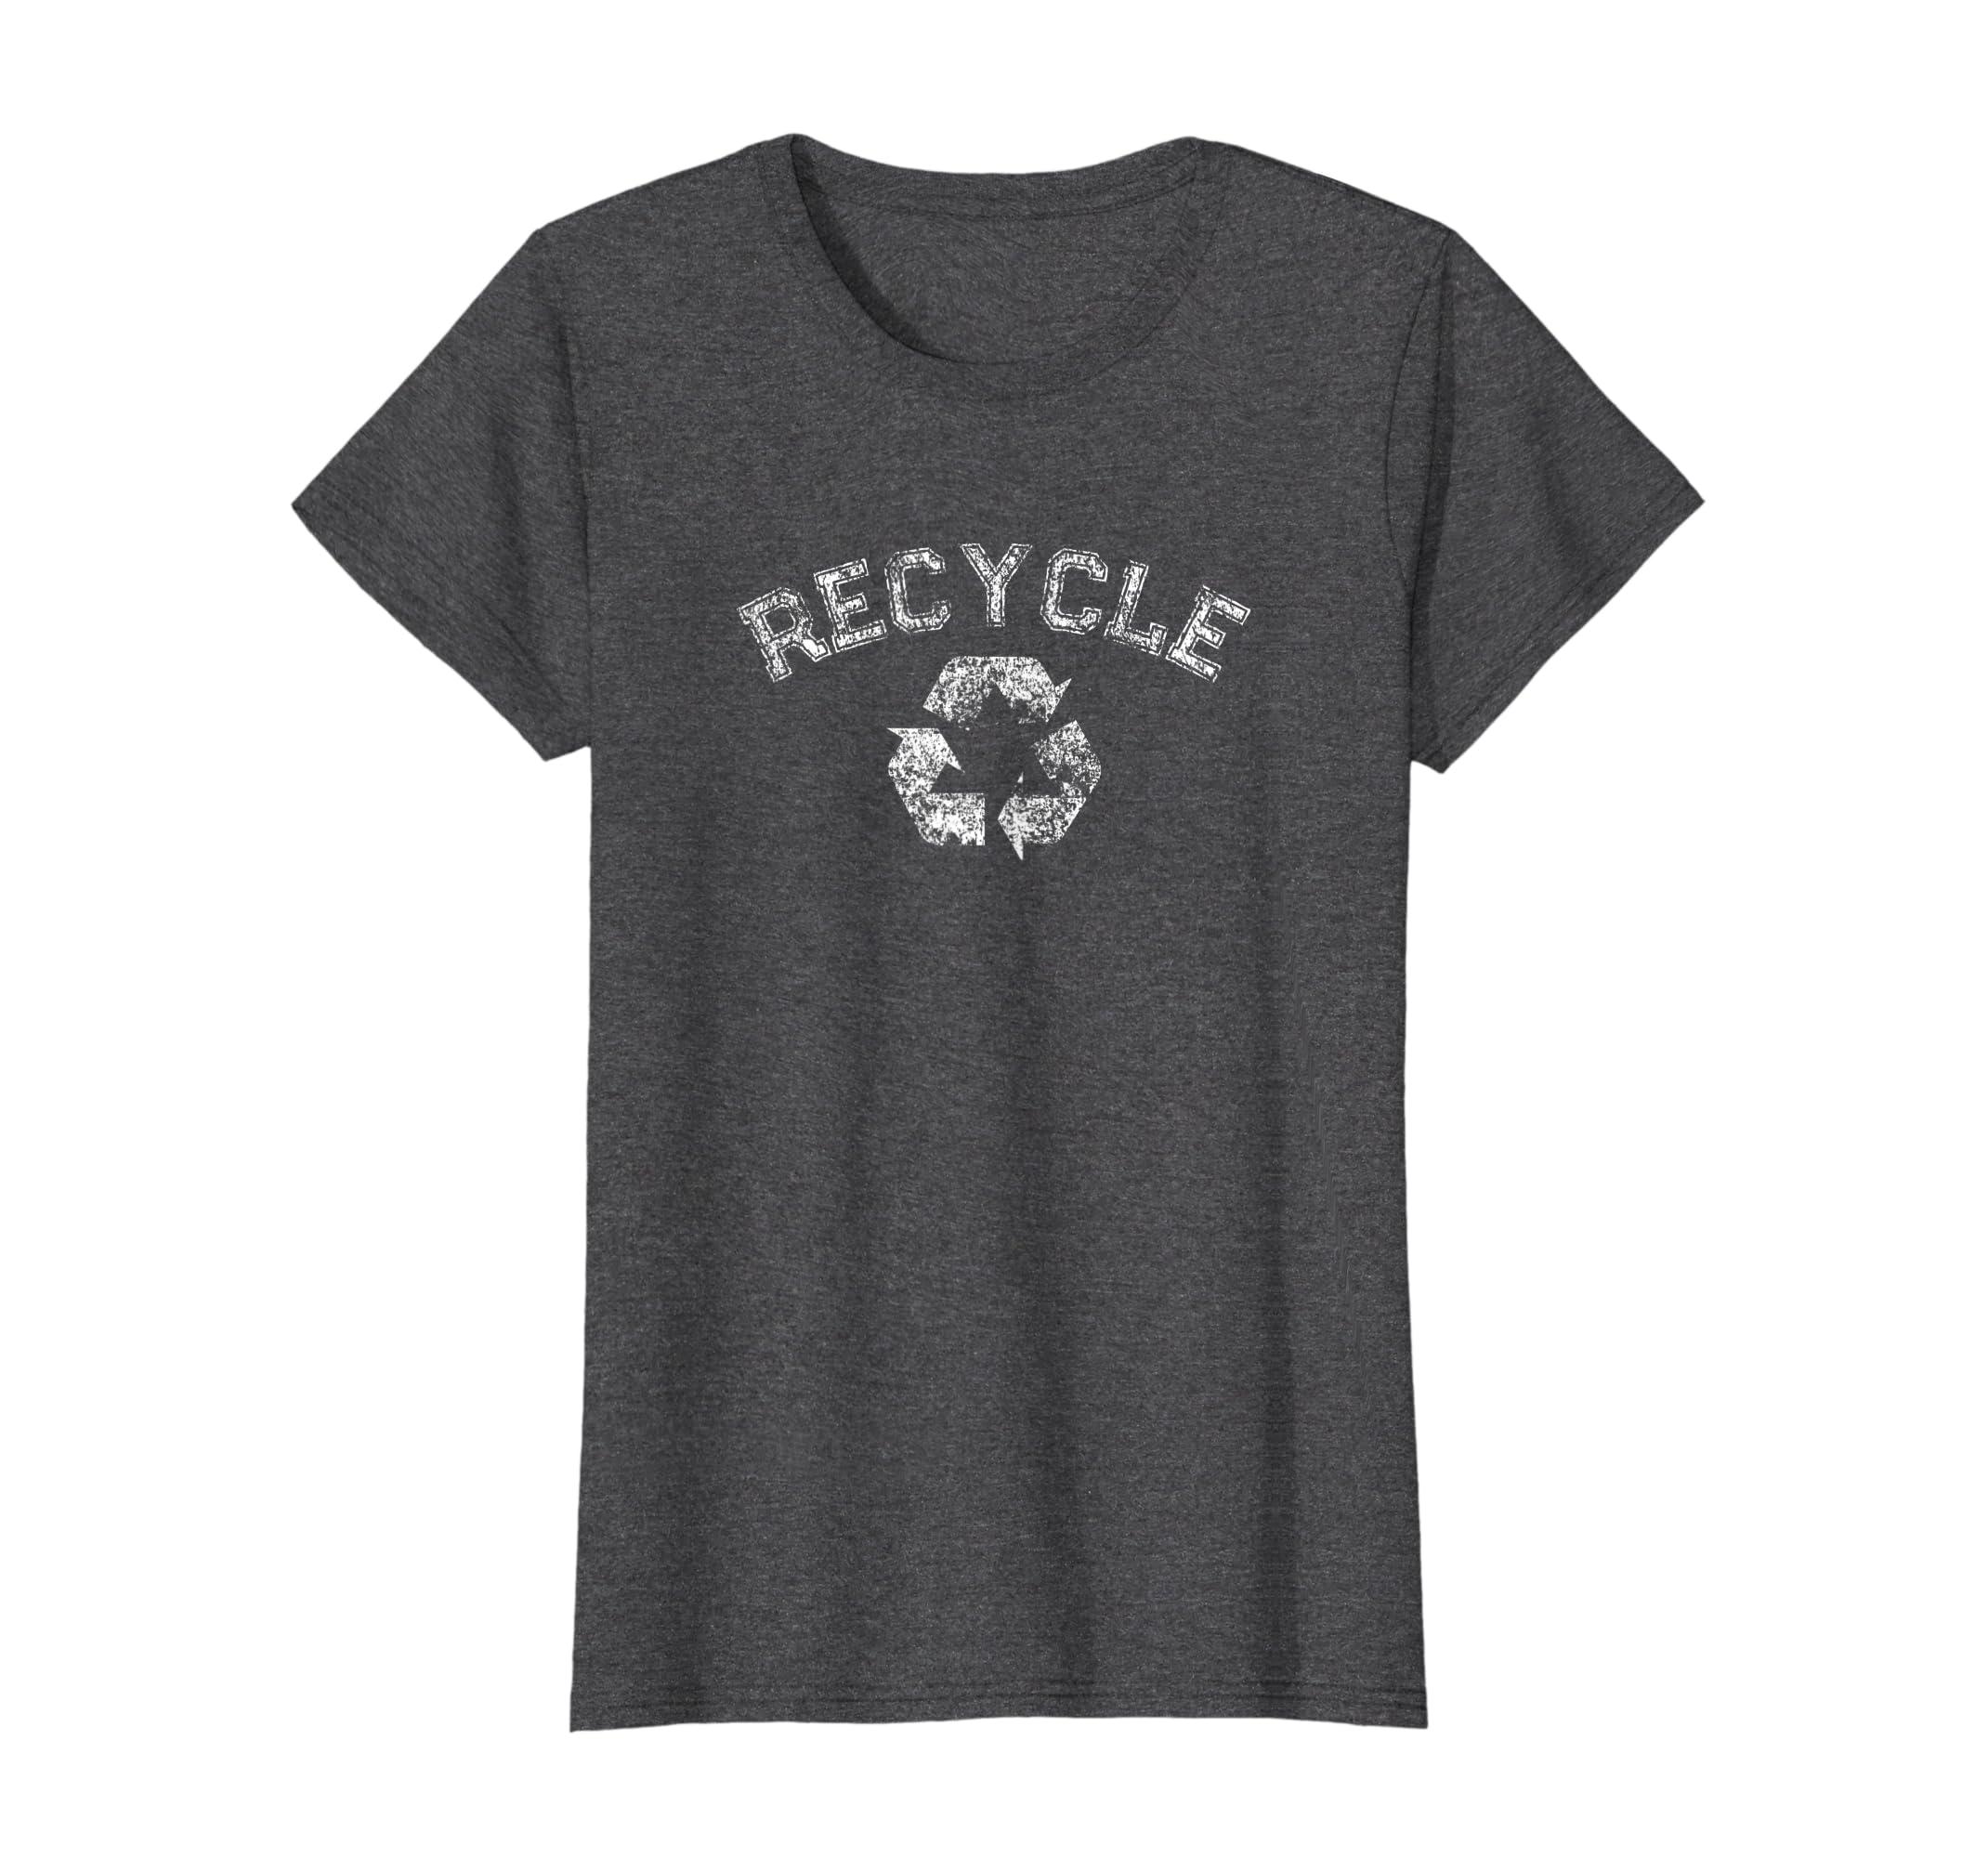 b34fec07c21 Amazon.com  Mens Graphic Tees Vintage Crunchy Hippie Recycle TShirt   Clothing